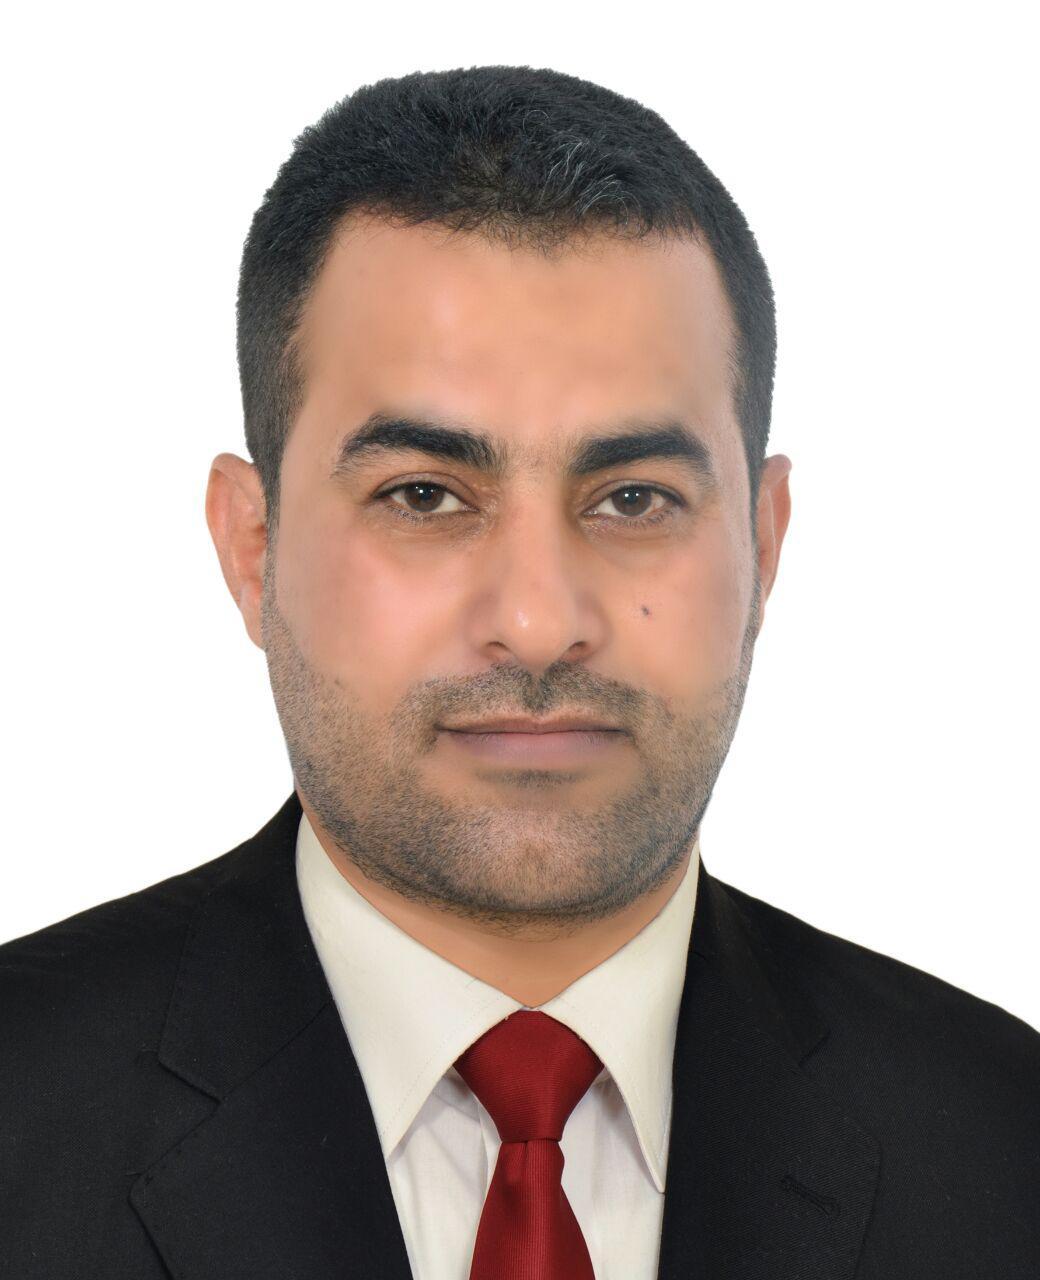 Walaa Khazal Salim